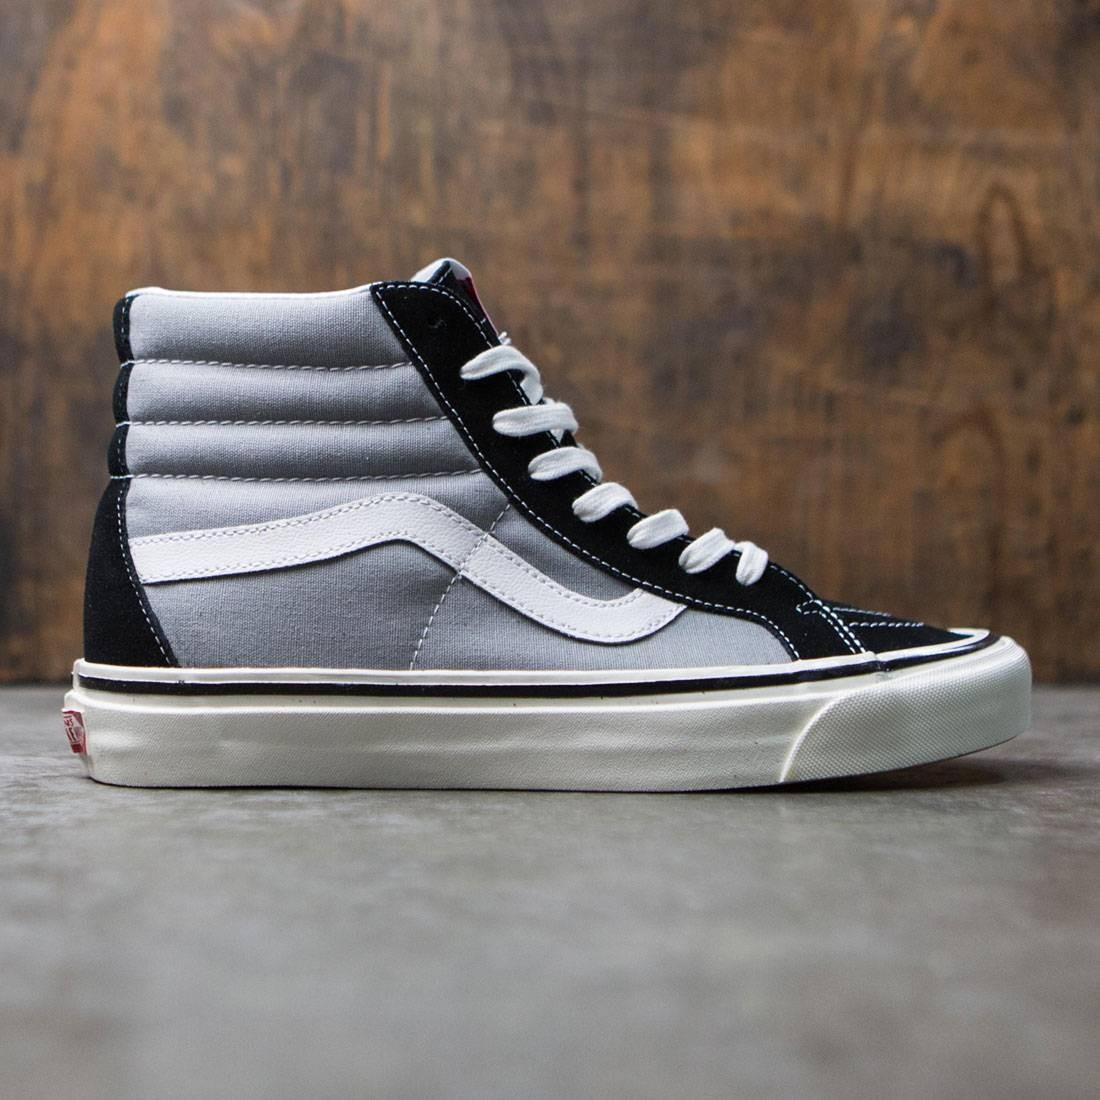 Vans Men SK8 Hi 38 DX Anahiem Factory Collection (gray black)